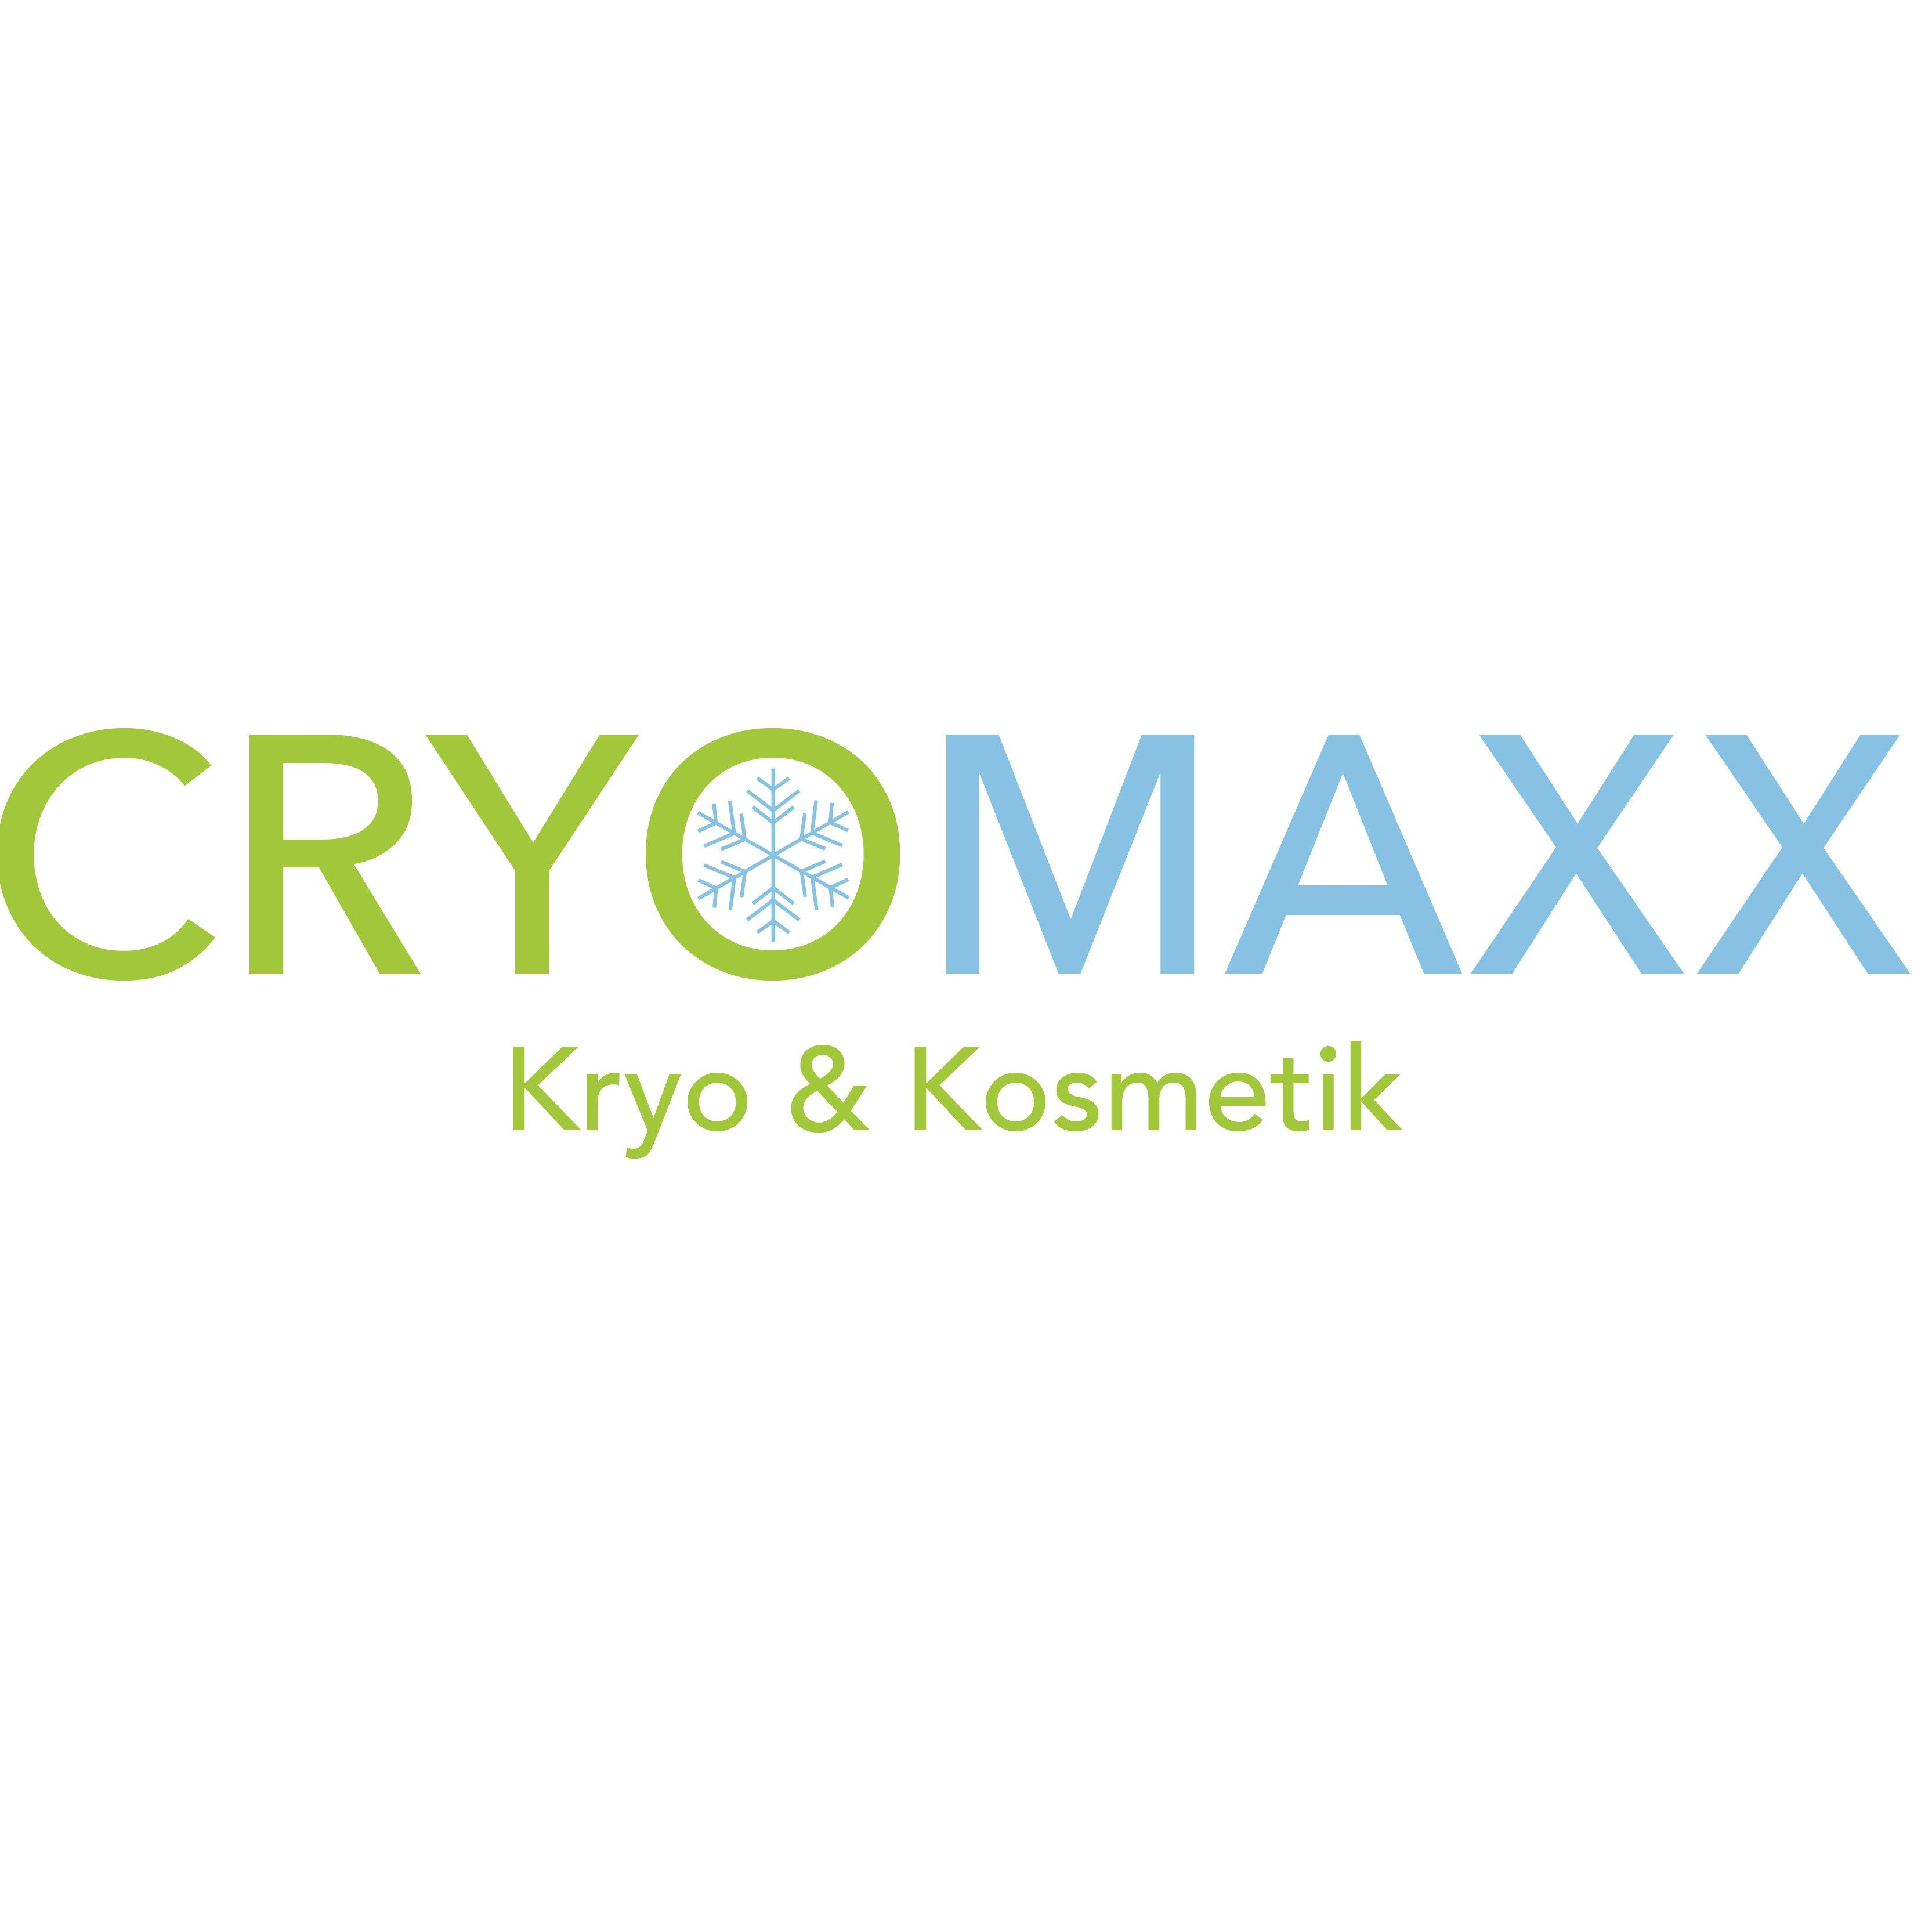 Bild zu CRYOMAXX Kryo & Kosmetik in Erlangen